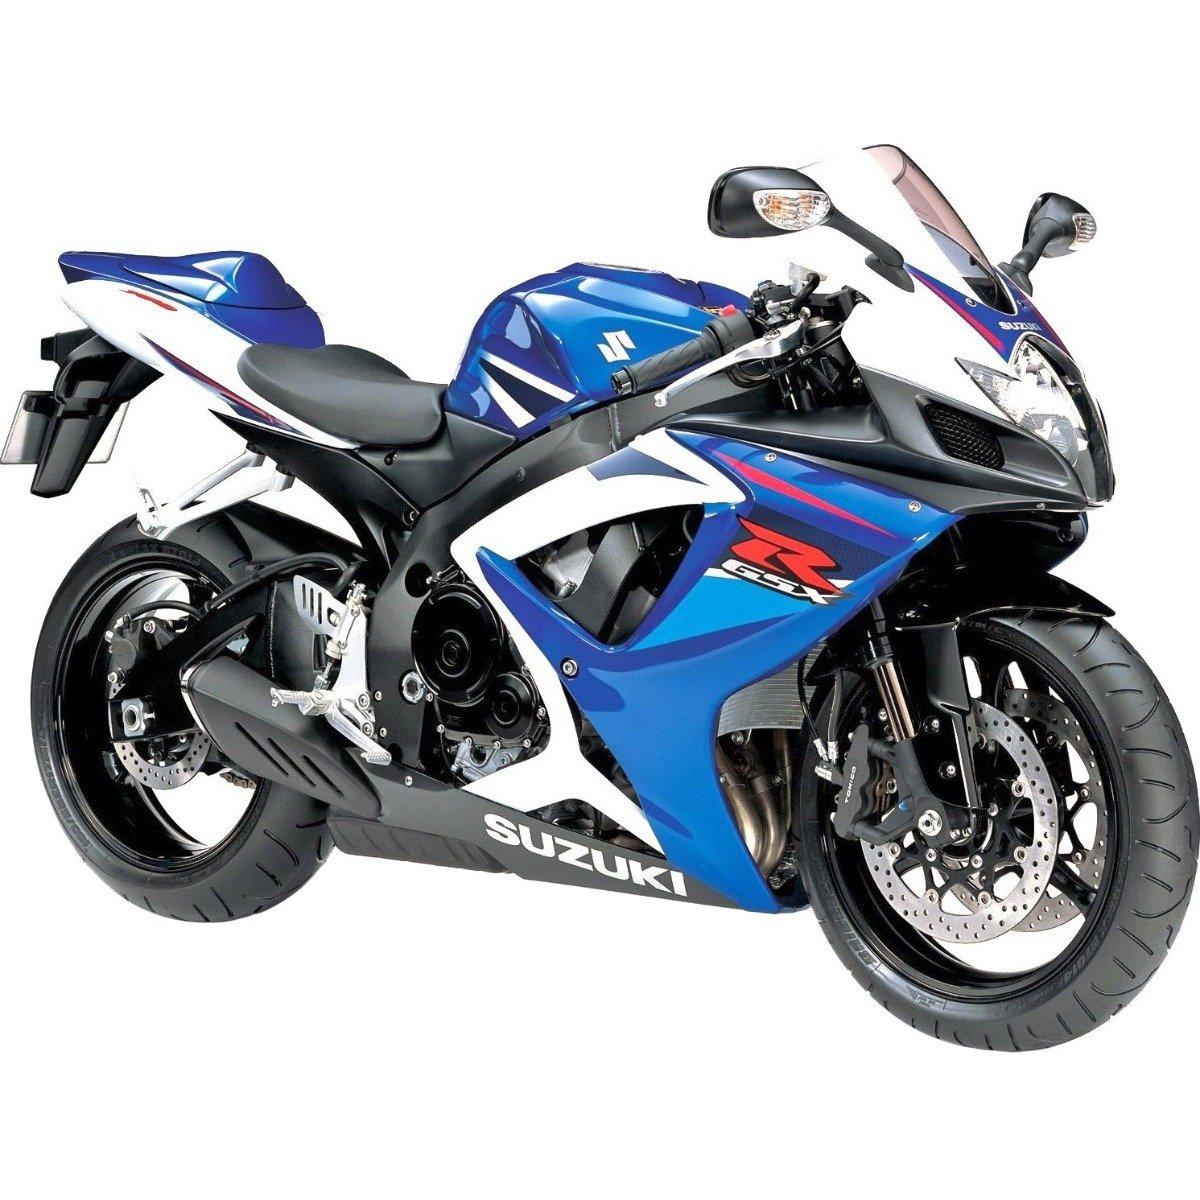 Motocicleta Maisto Suzuki GSX-R750, 1:12